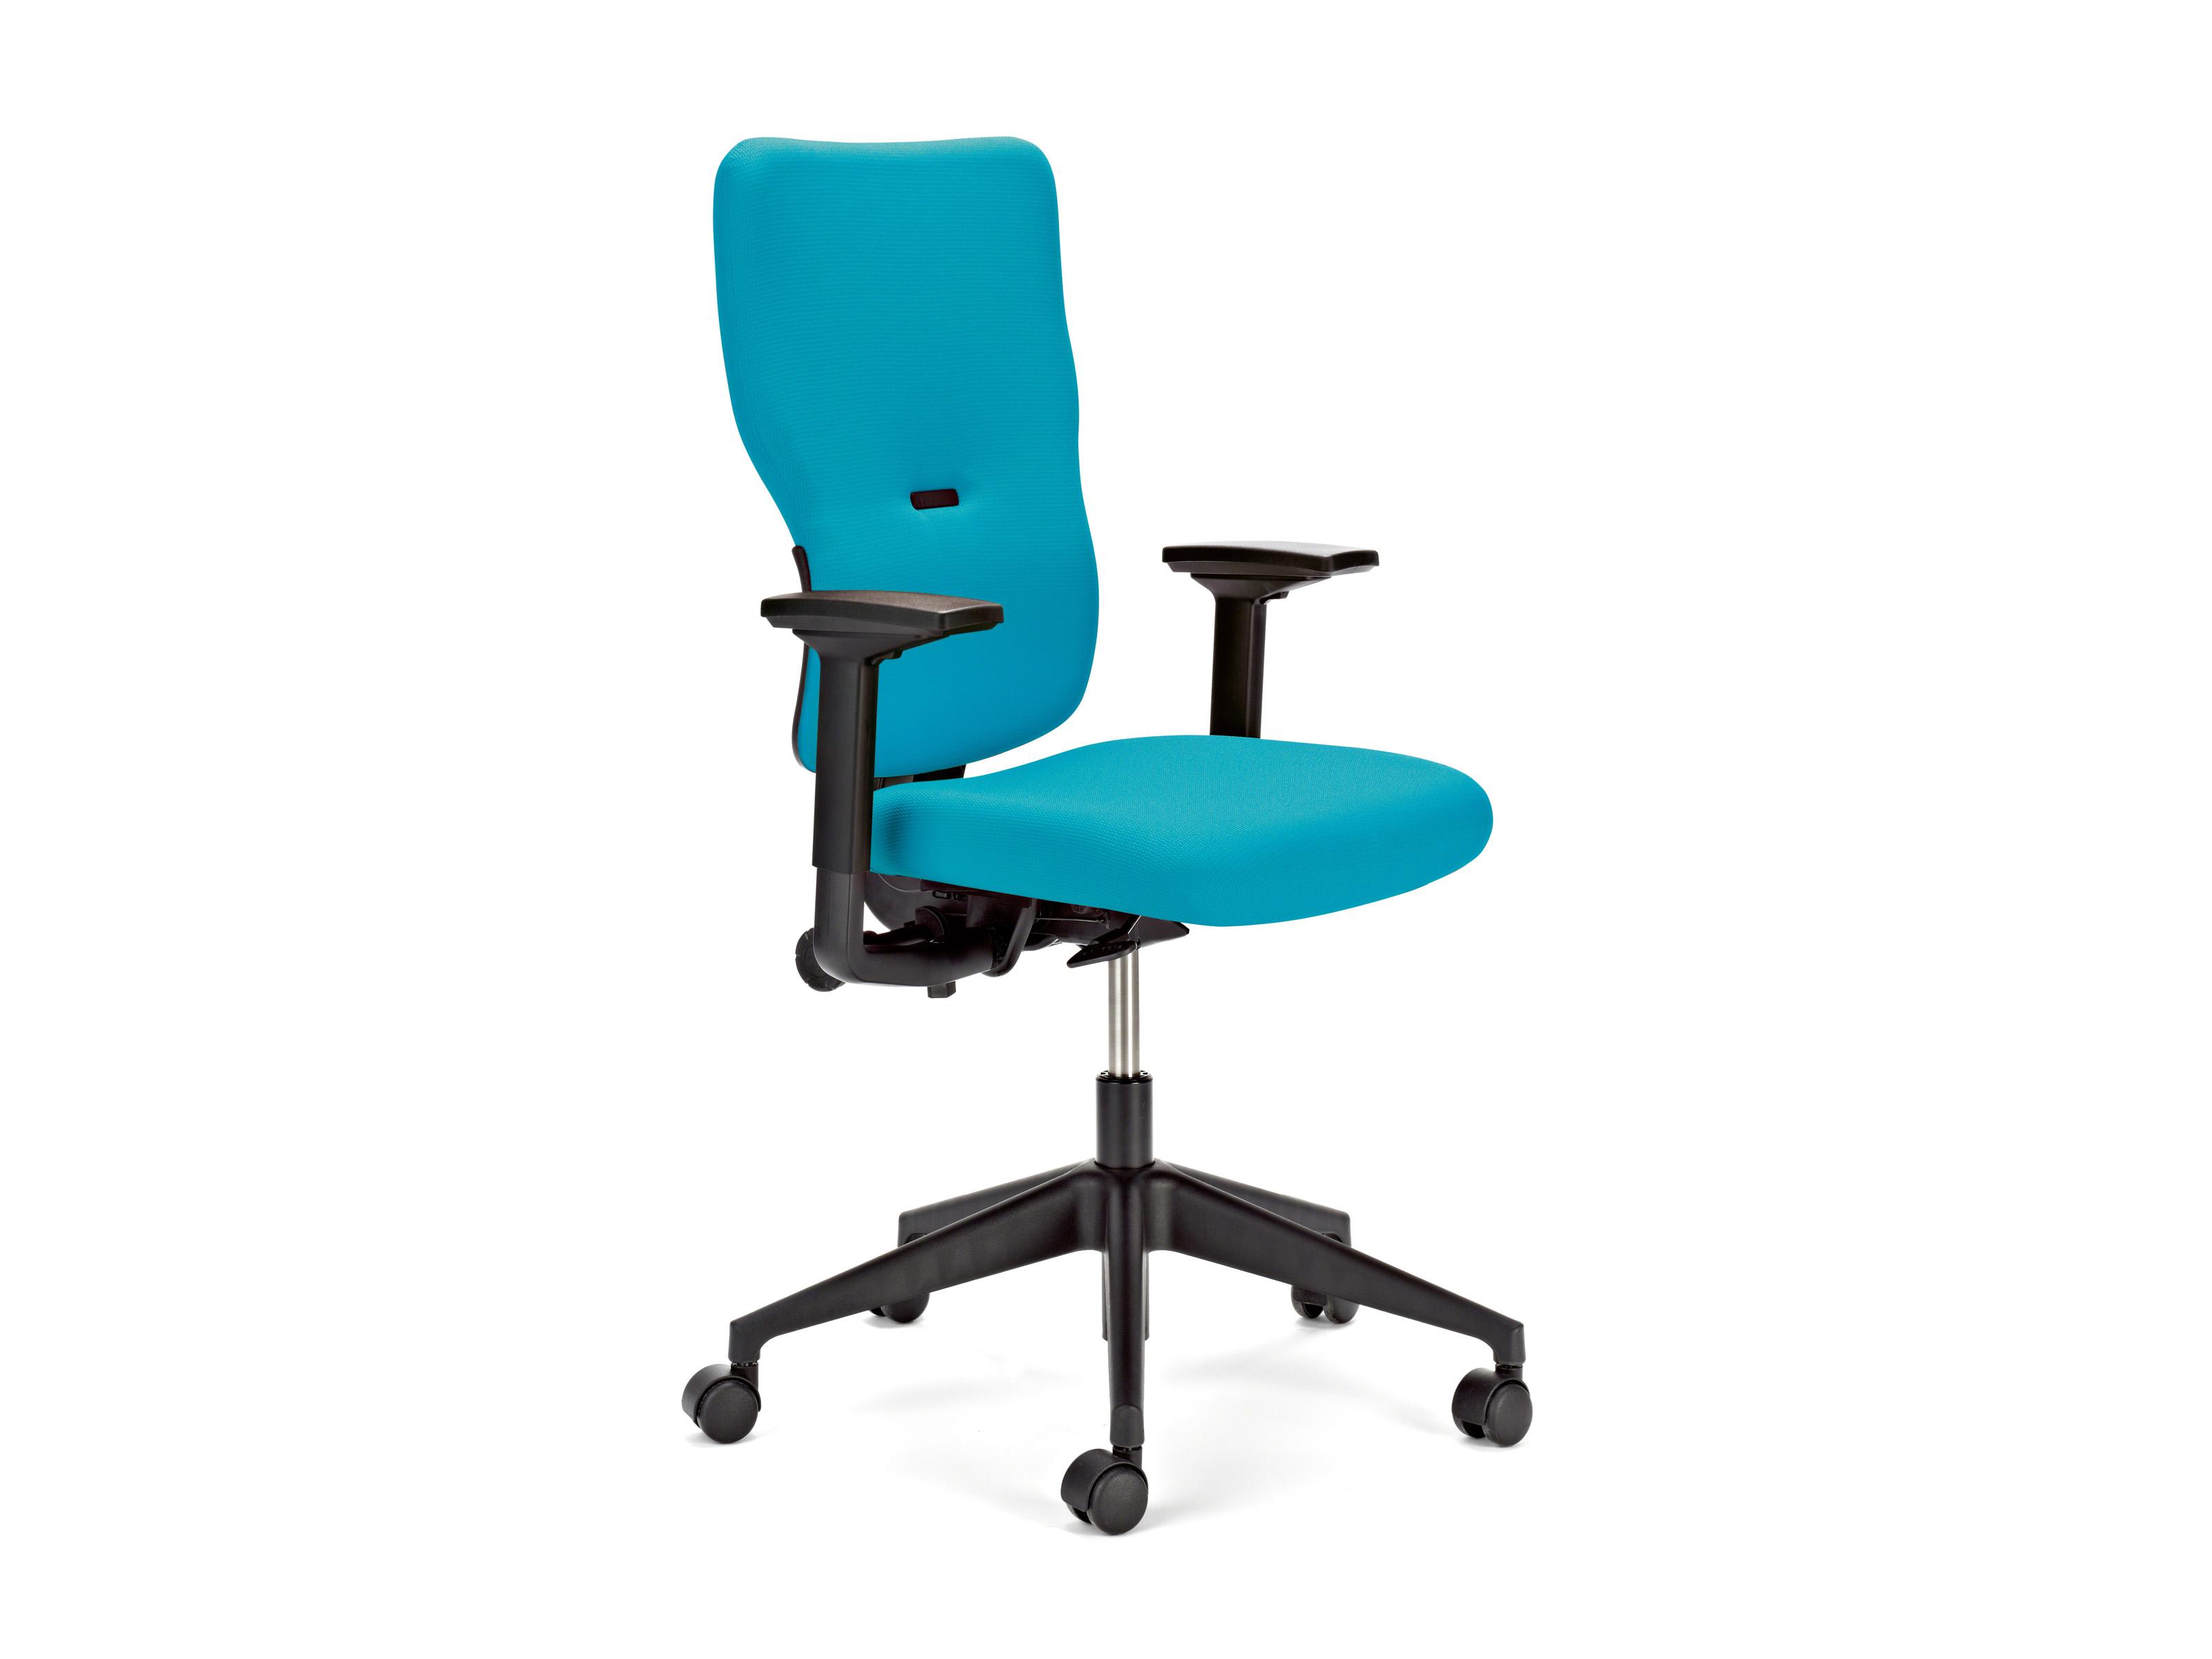 Siete pautas para elegir bien tu silla de oficina for Silla para visitas oficina